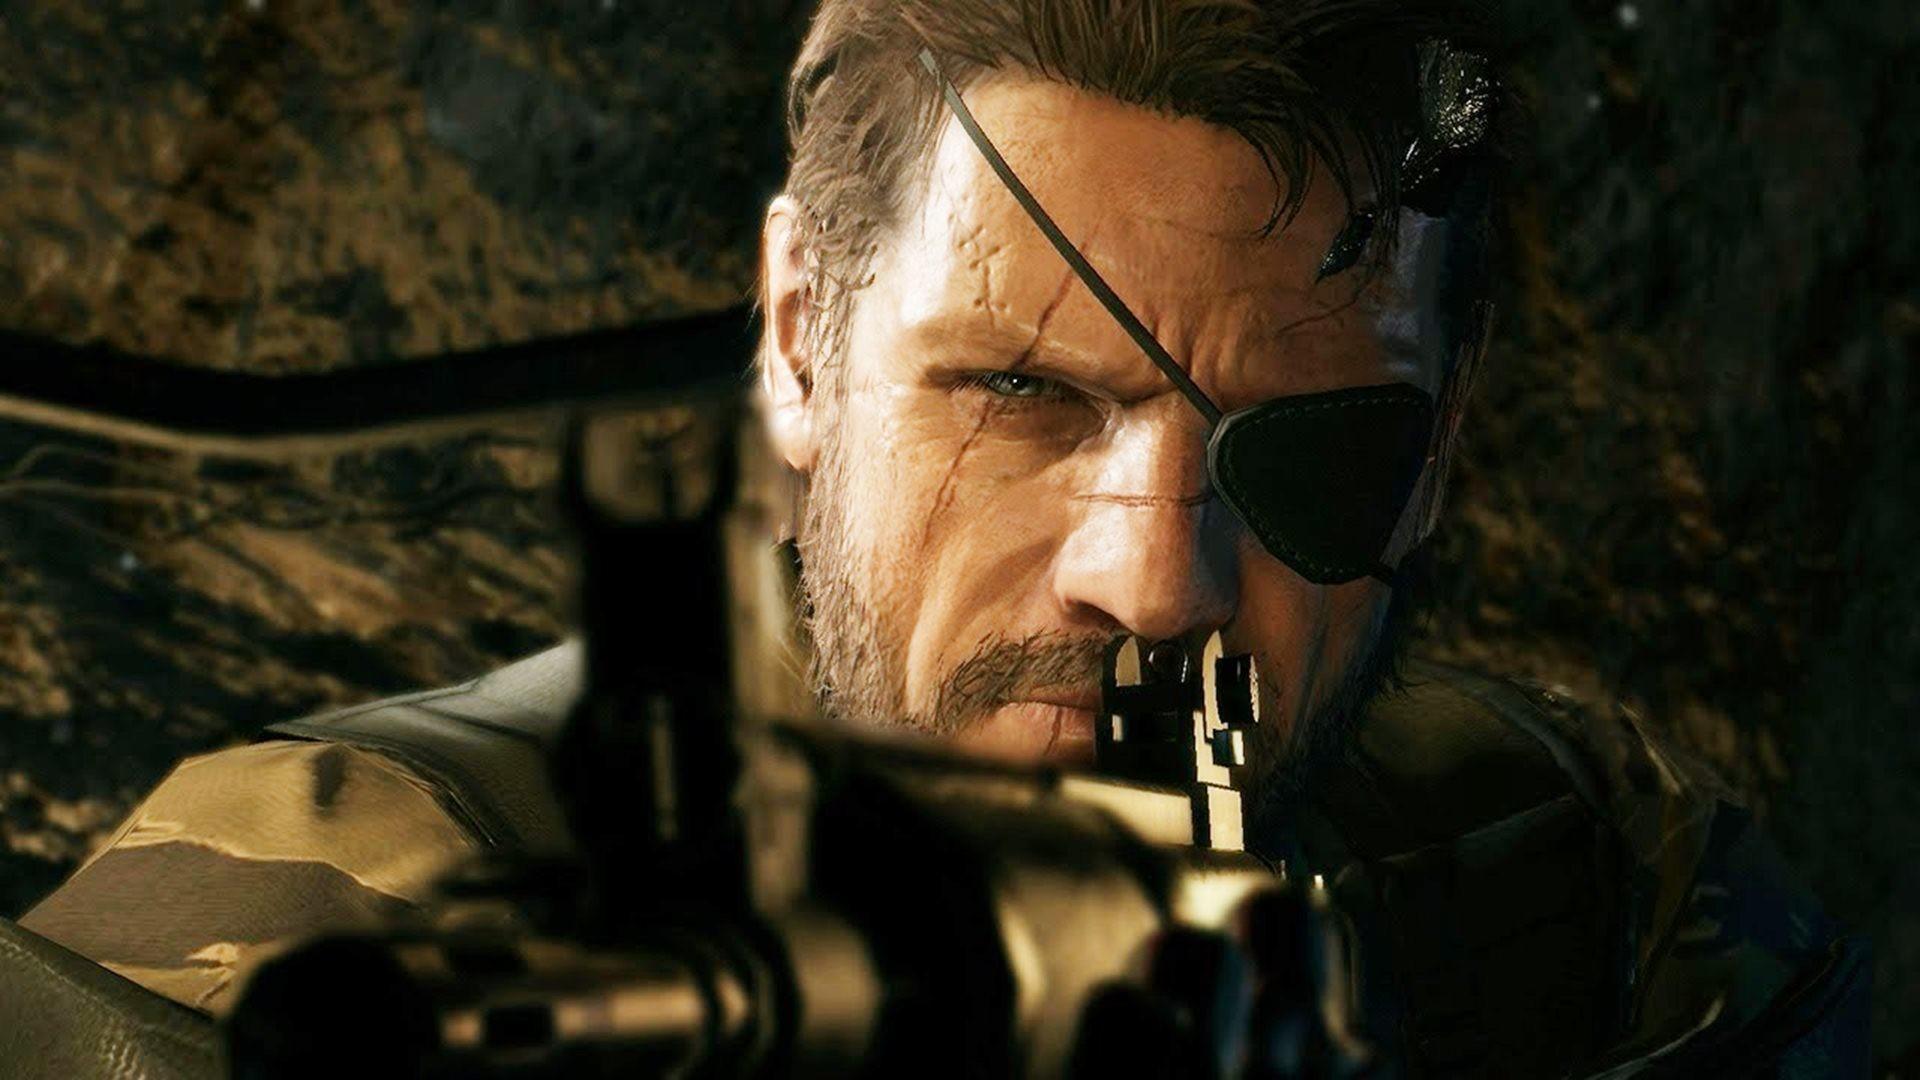 … Metal Gear Solid 5 The Phantom Pain Widescreen Wallpaper